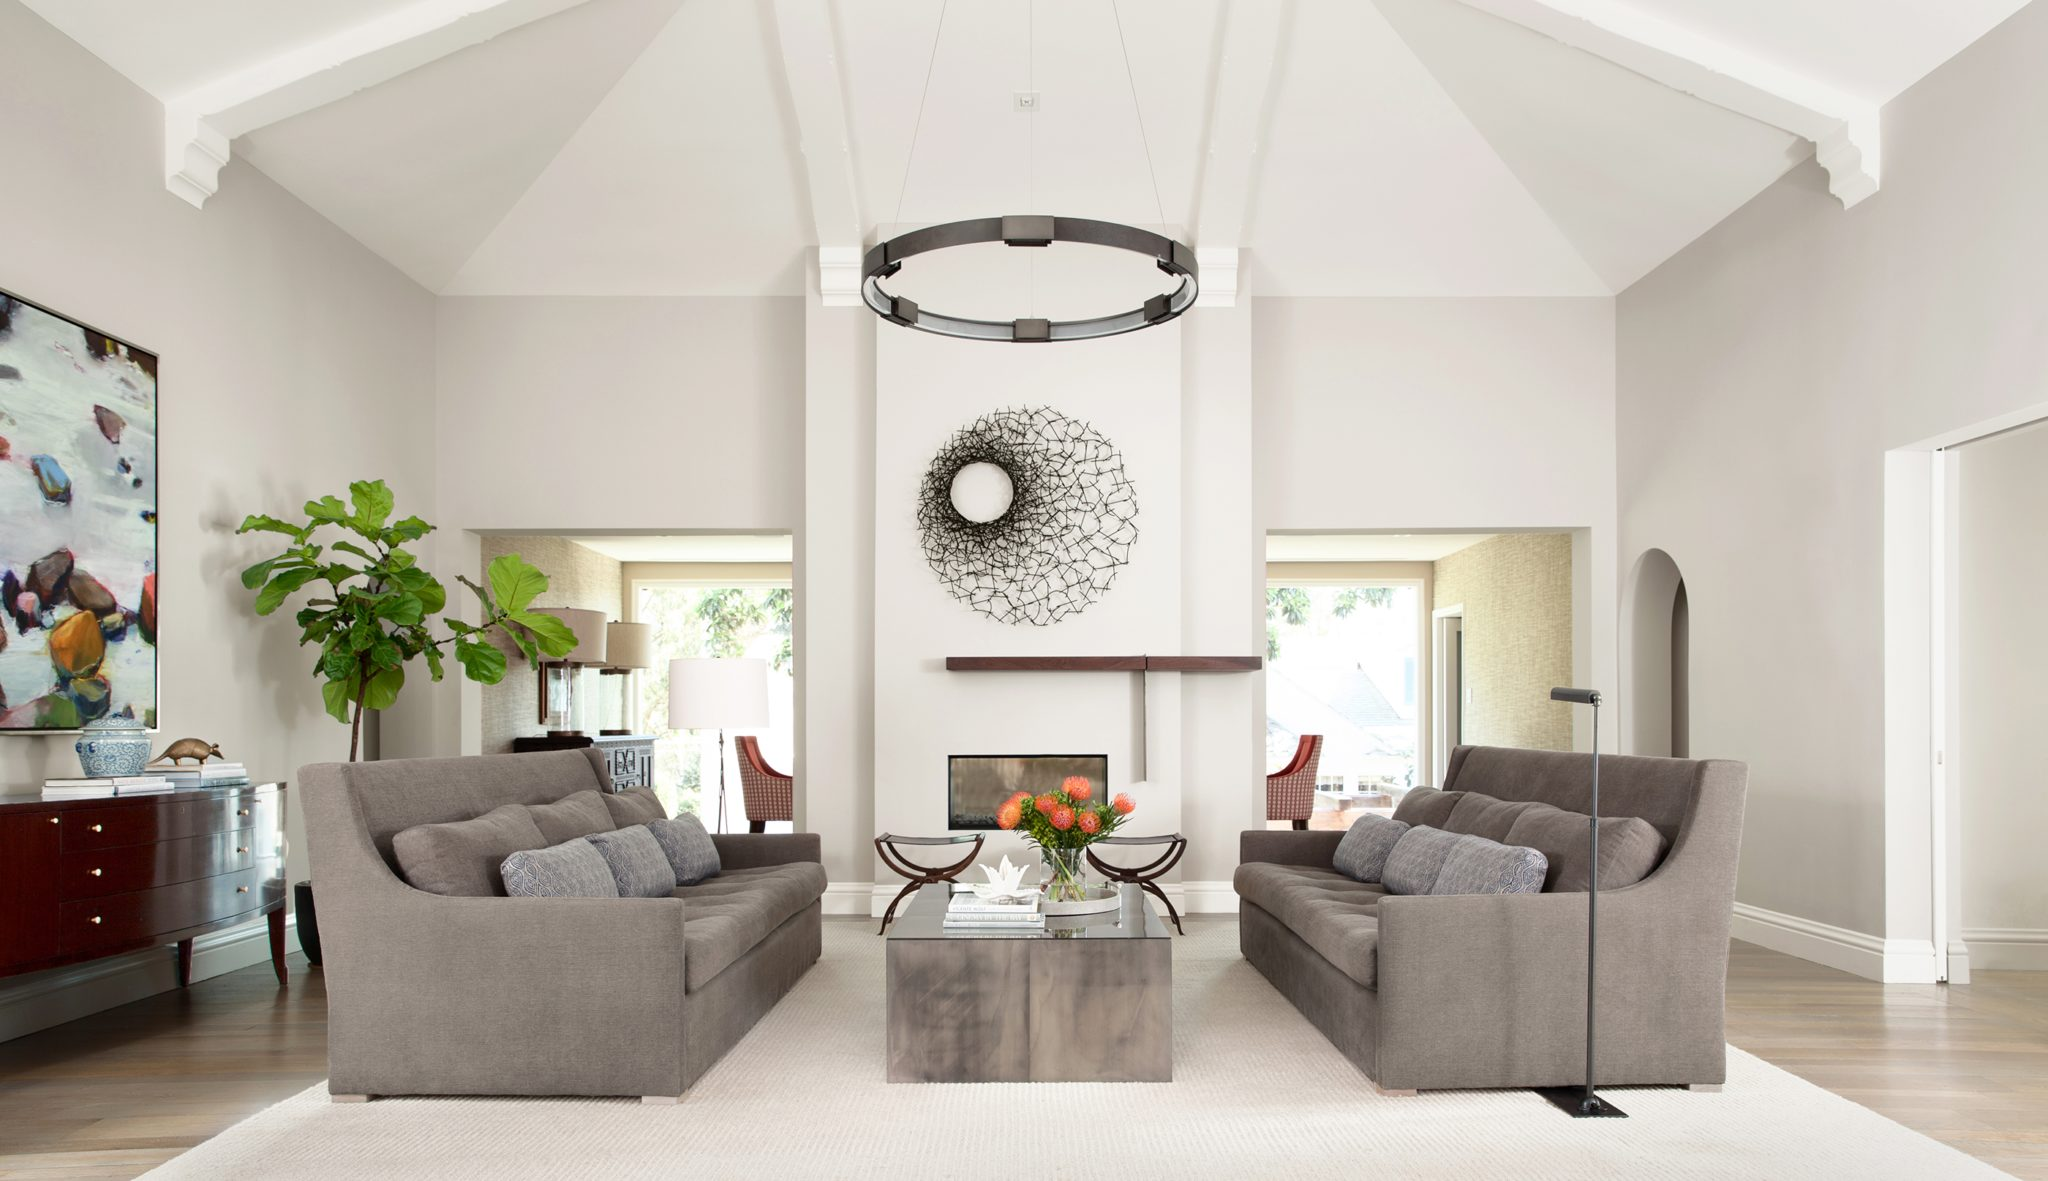 Interior design by Niche Interiors